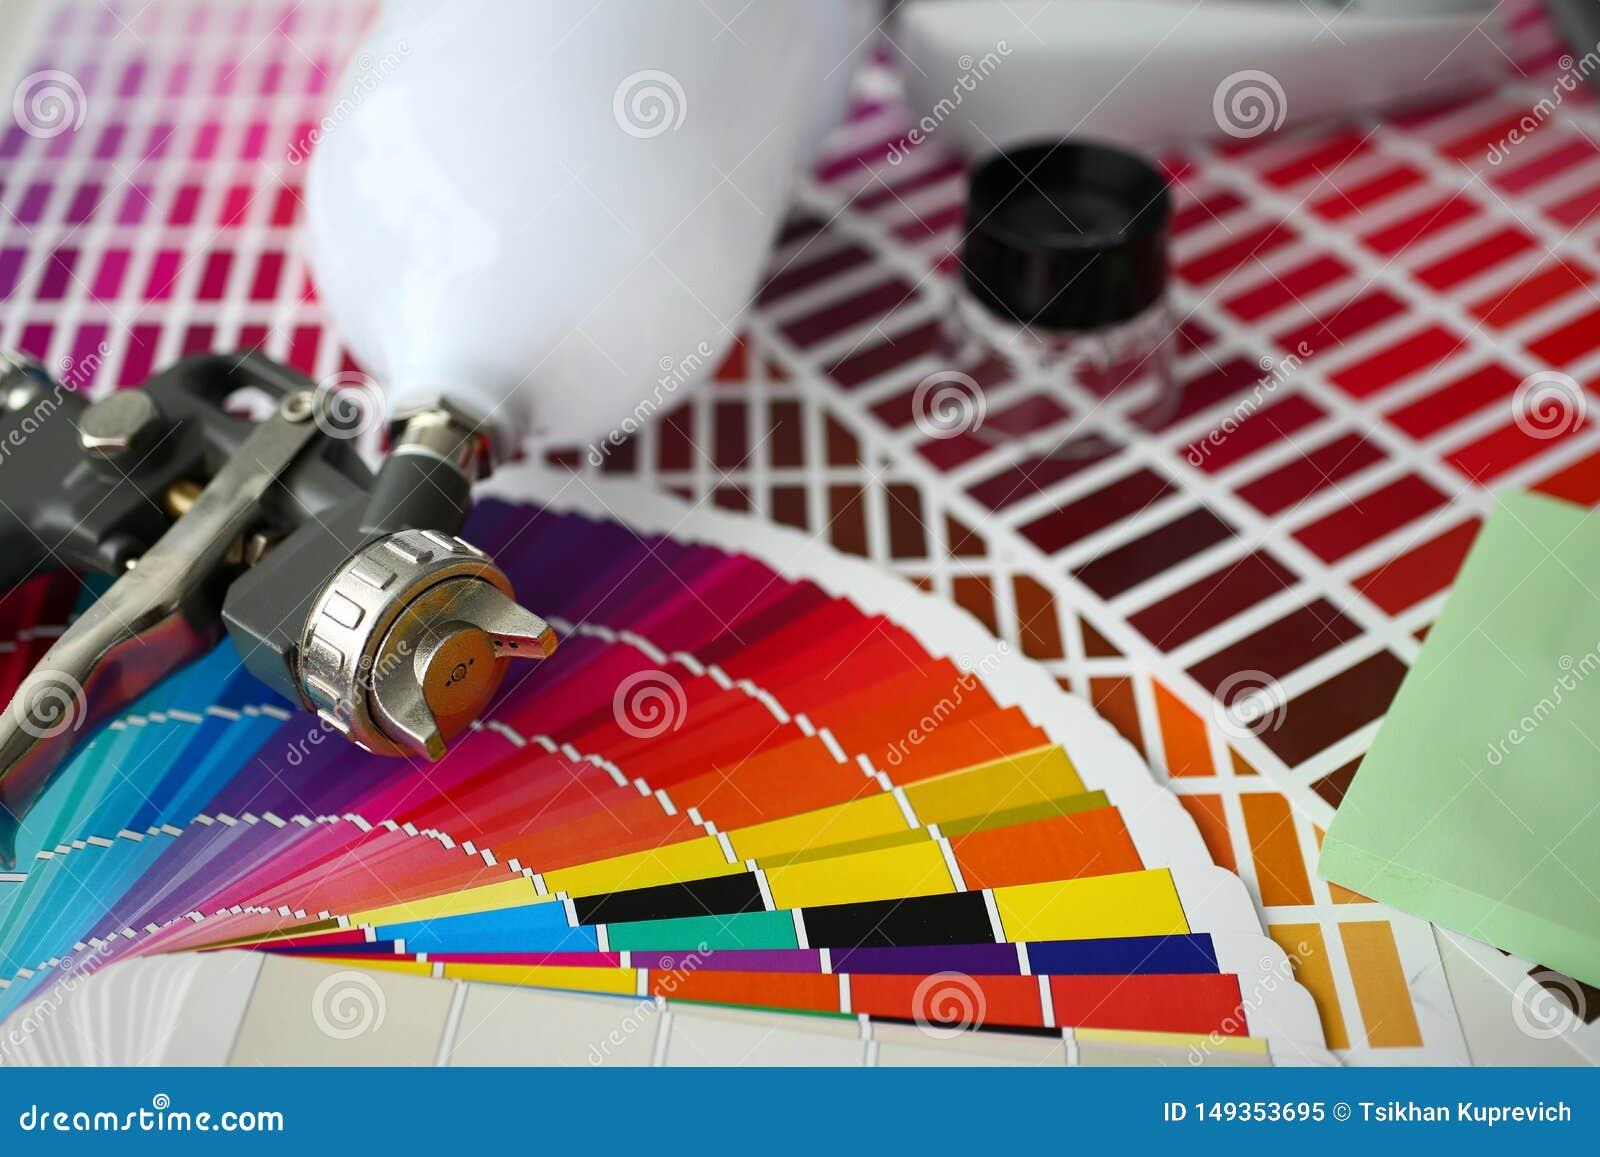 Closeup View Of Airbrush Gun Lying At Colour Check Stock